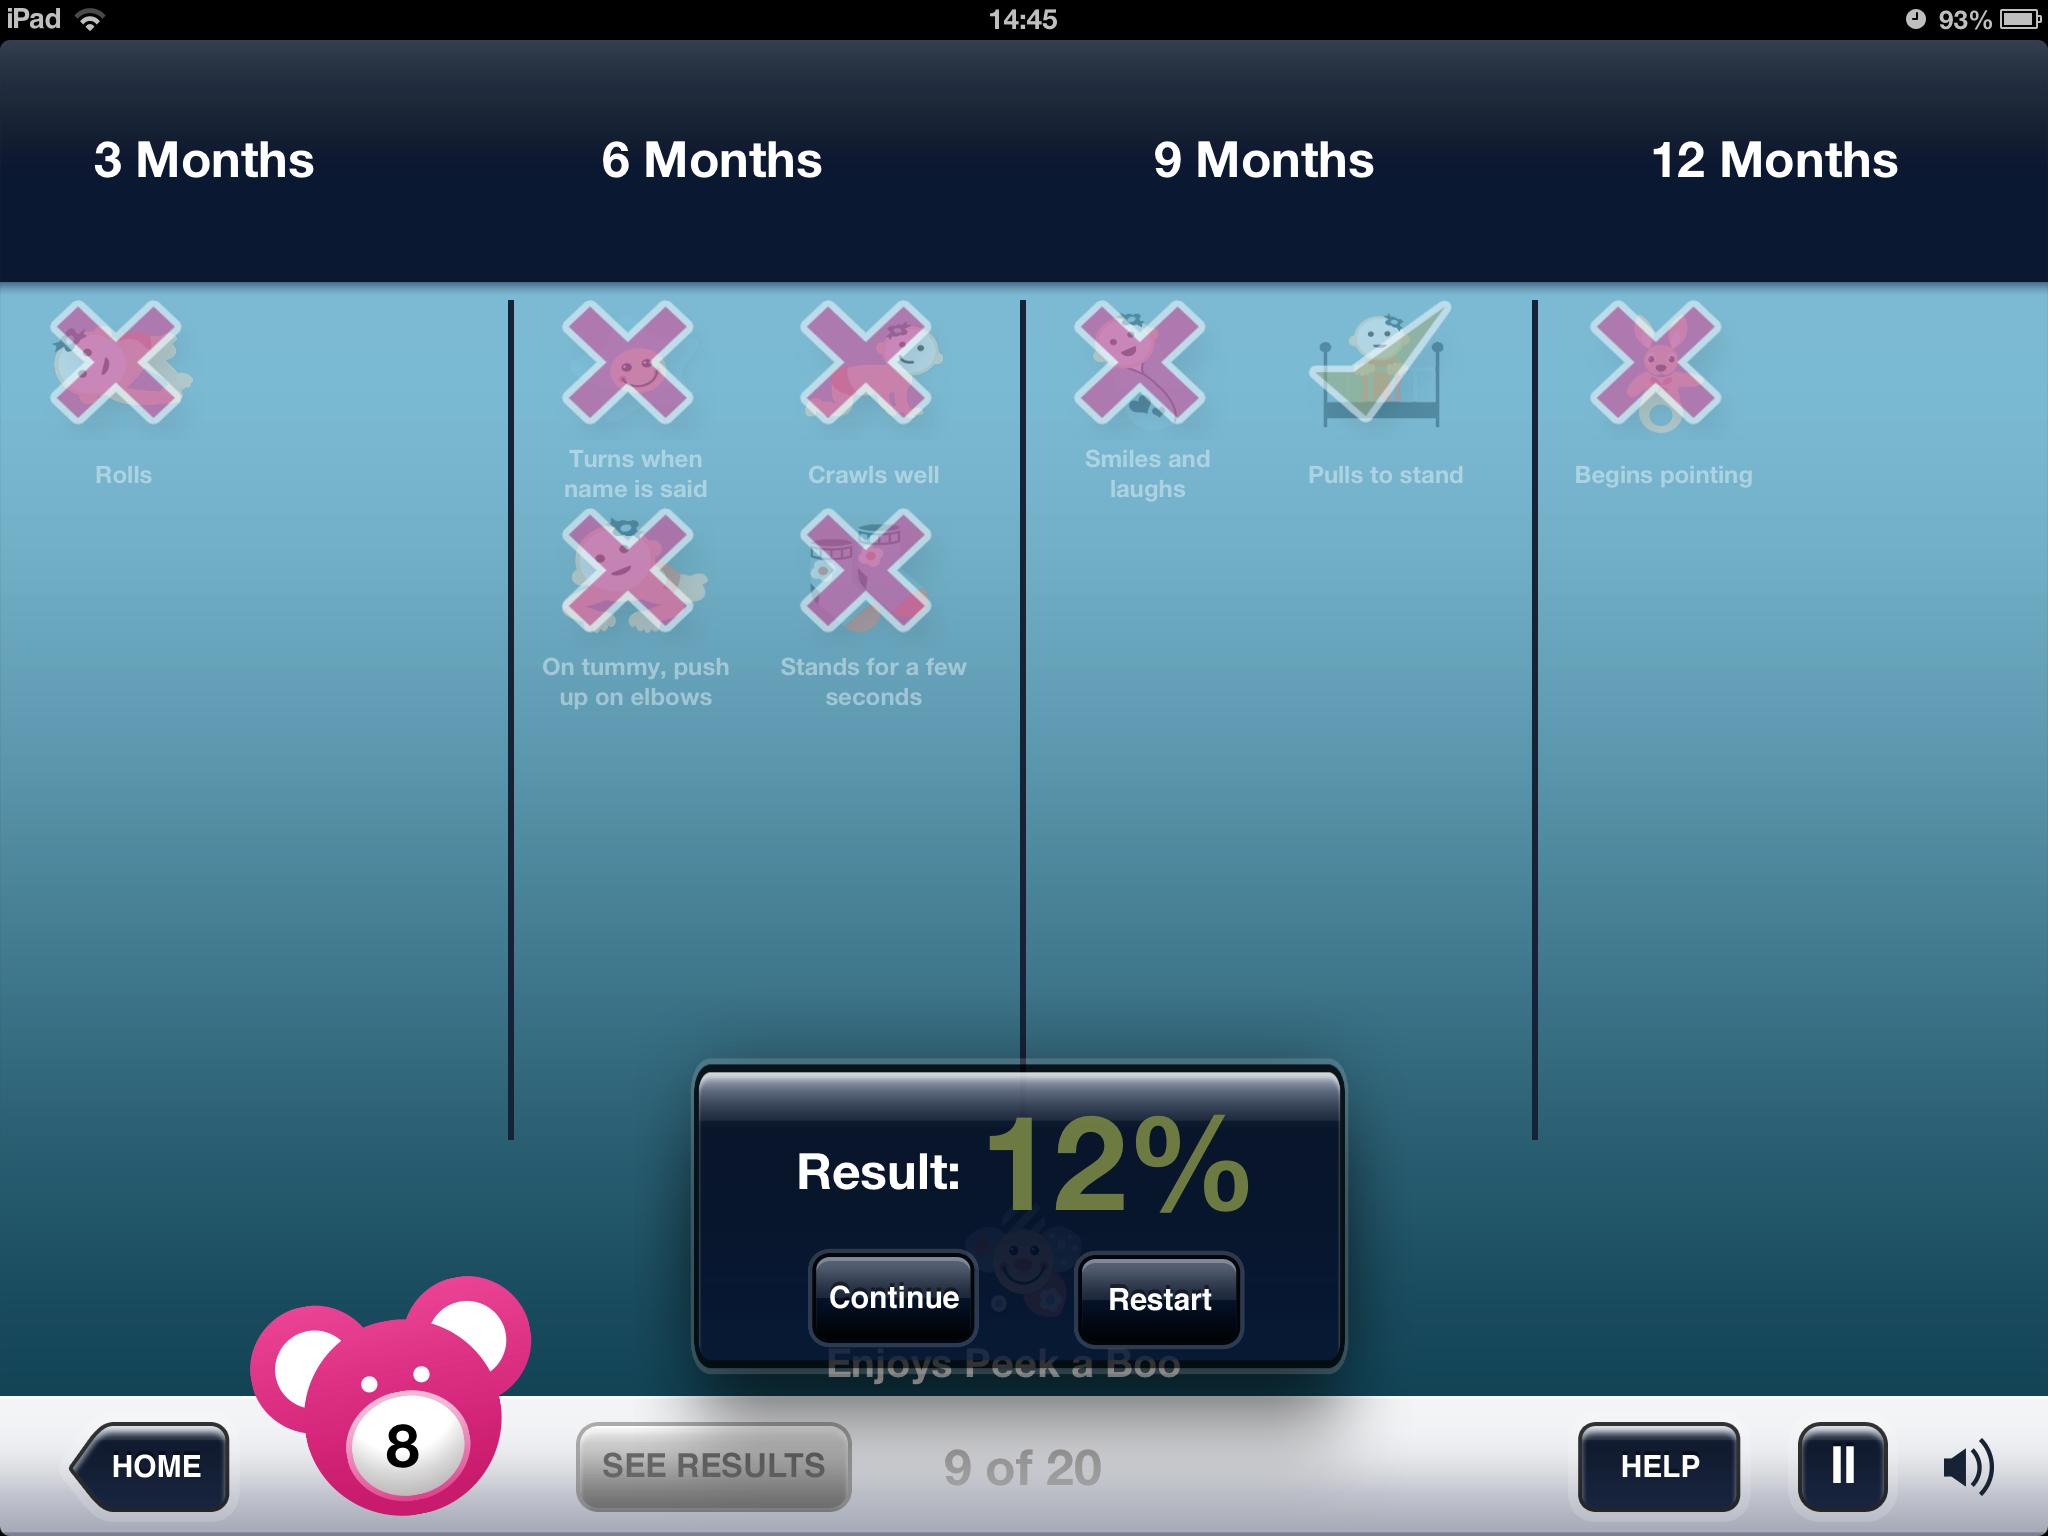 iPad app Launch of Baby Development Activities App v1.0 (+free app give-a-way)